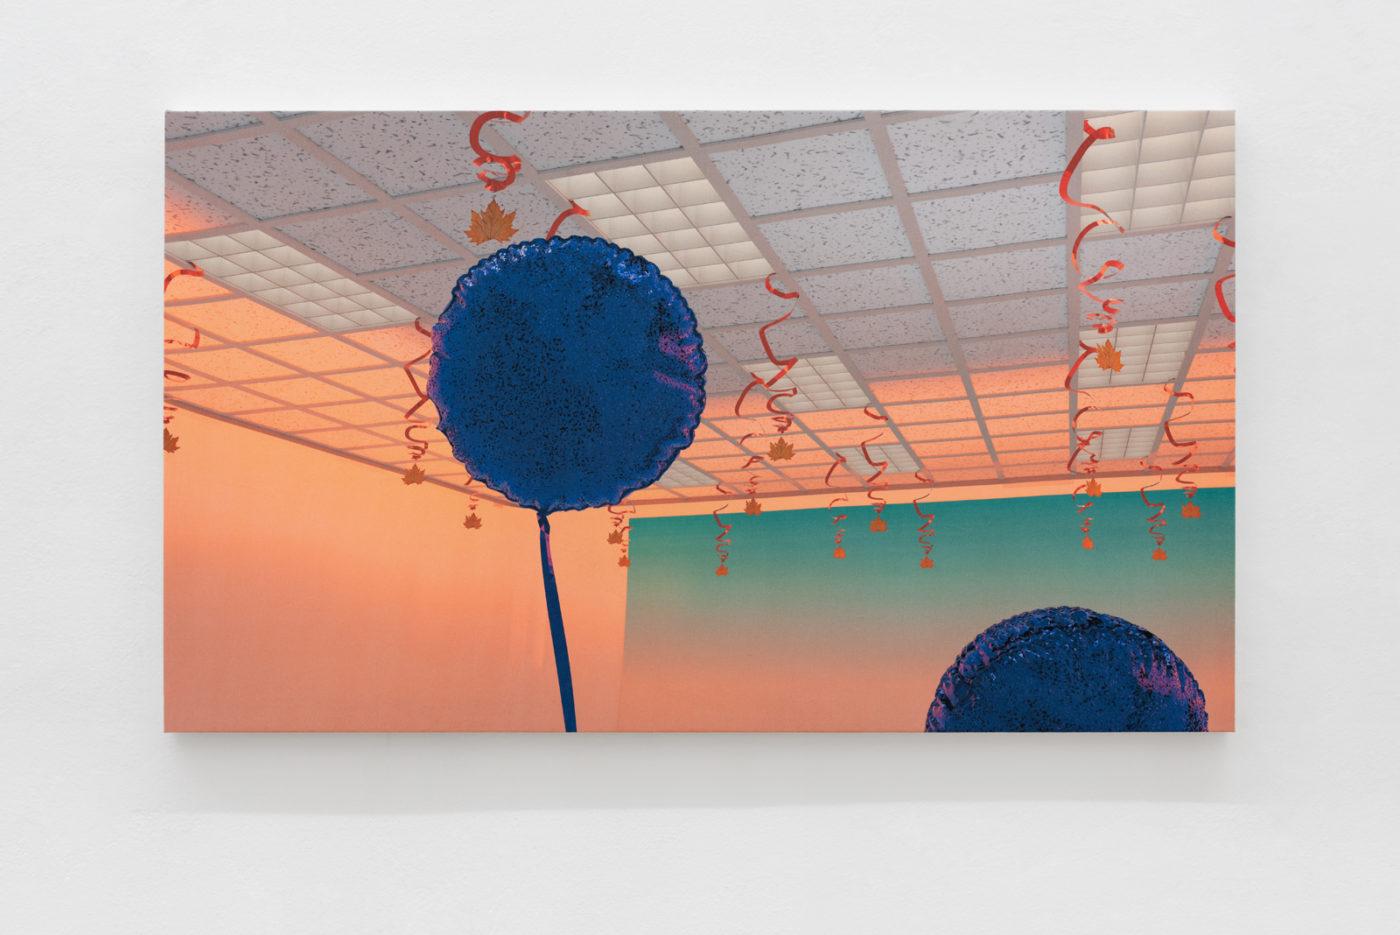 Andrew Ross - Hallmark. Clima gallery, Milano